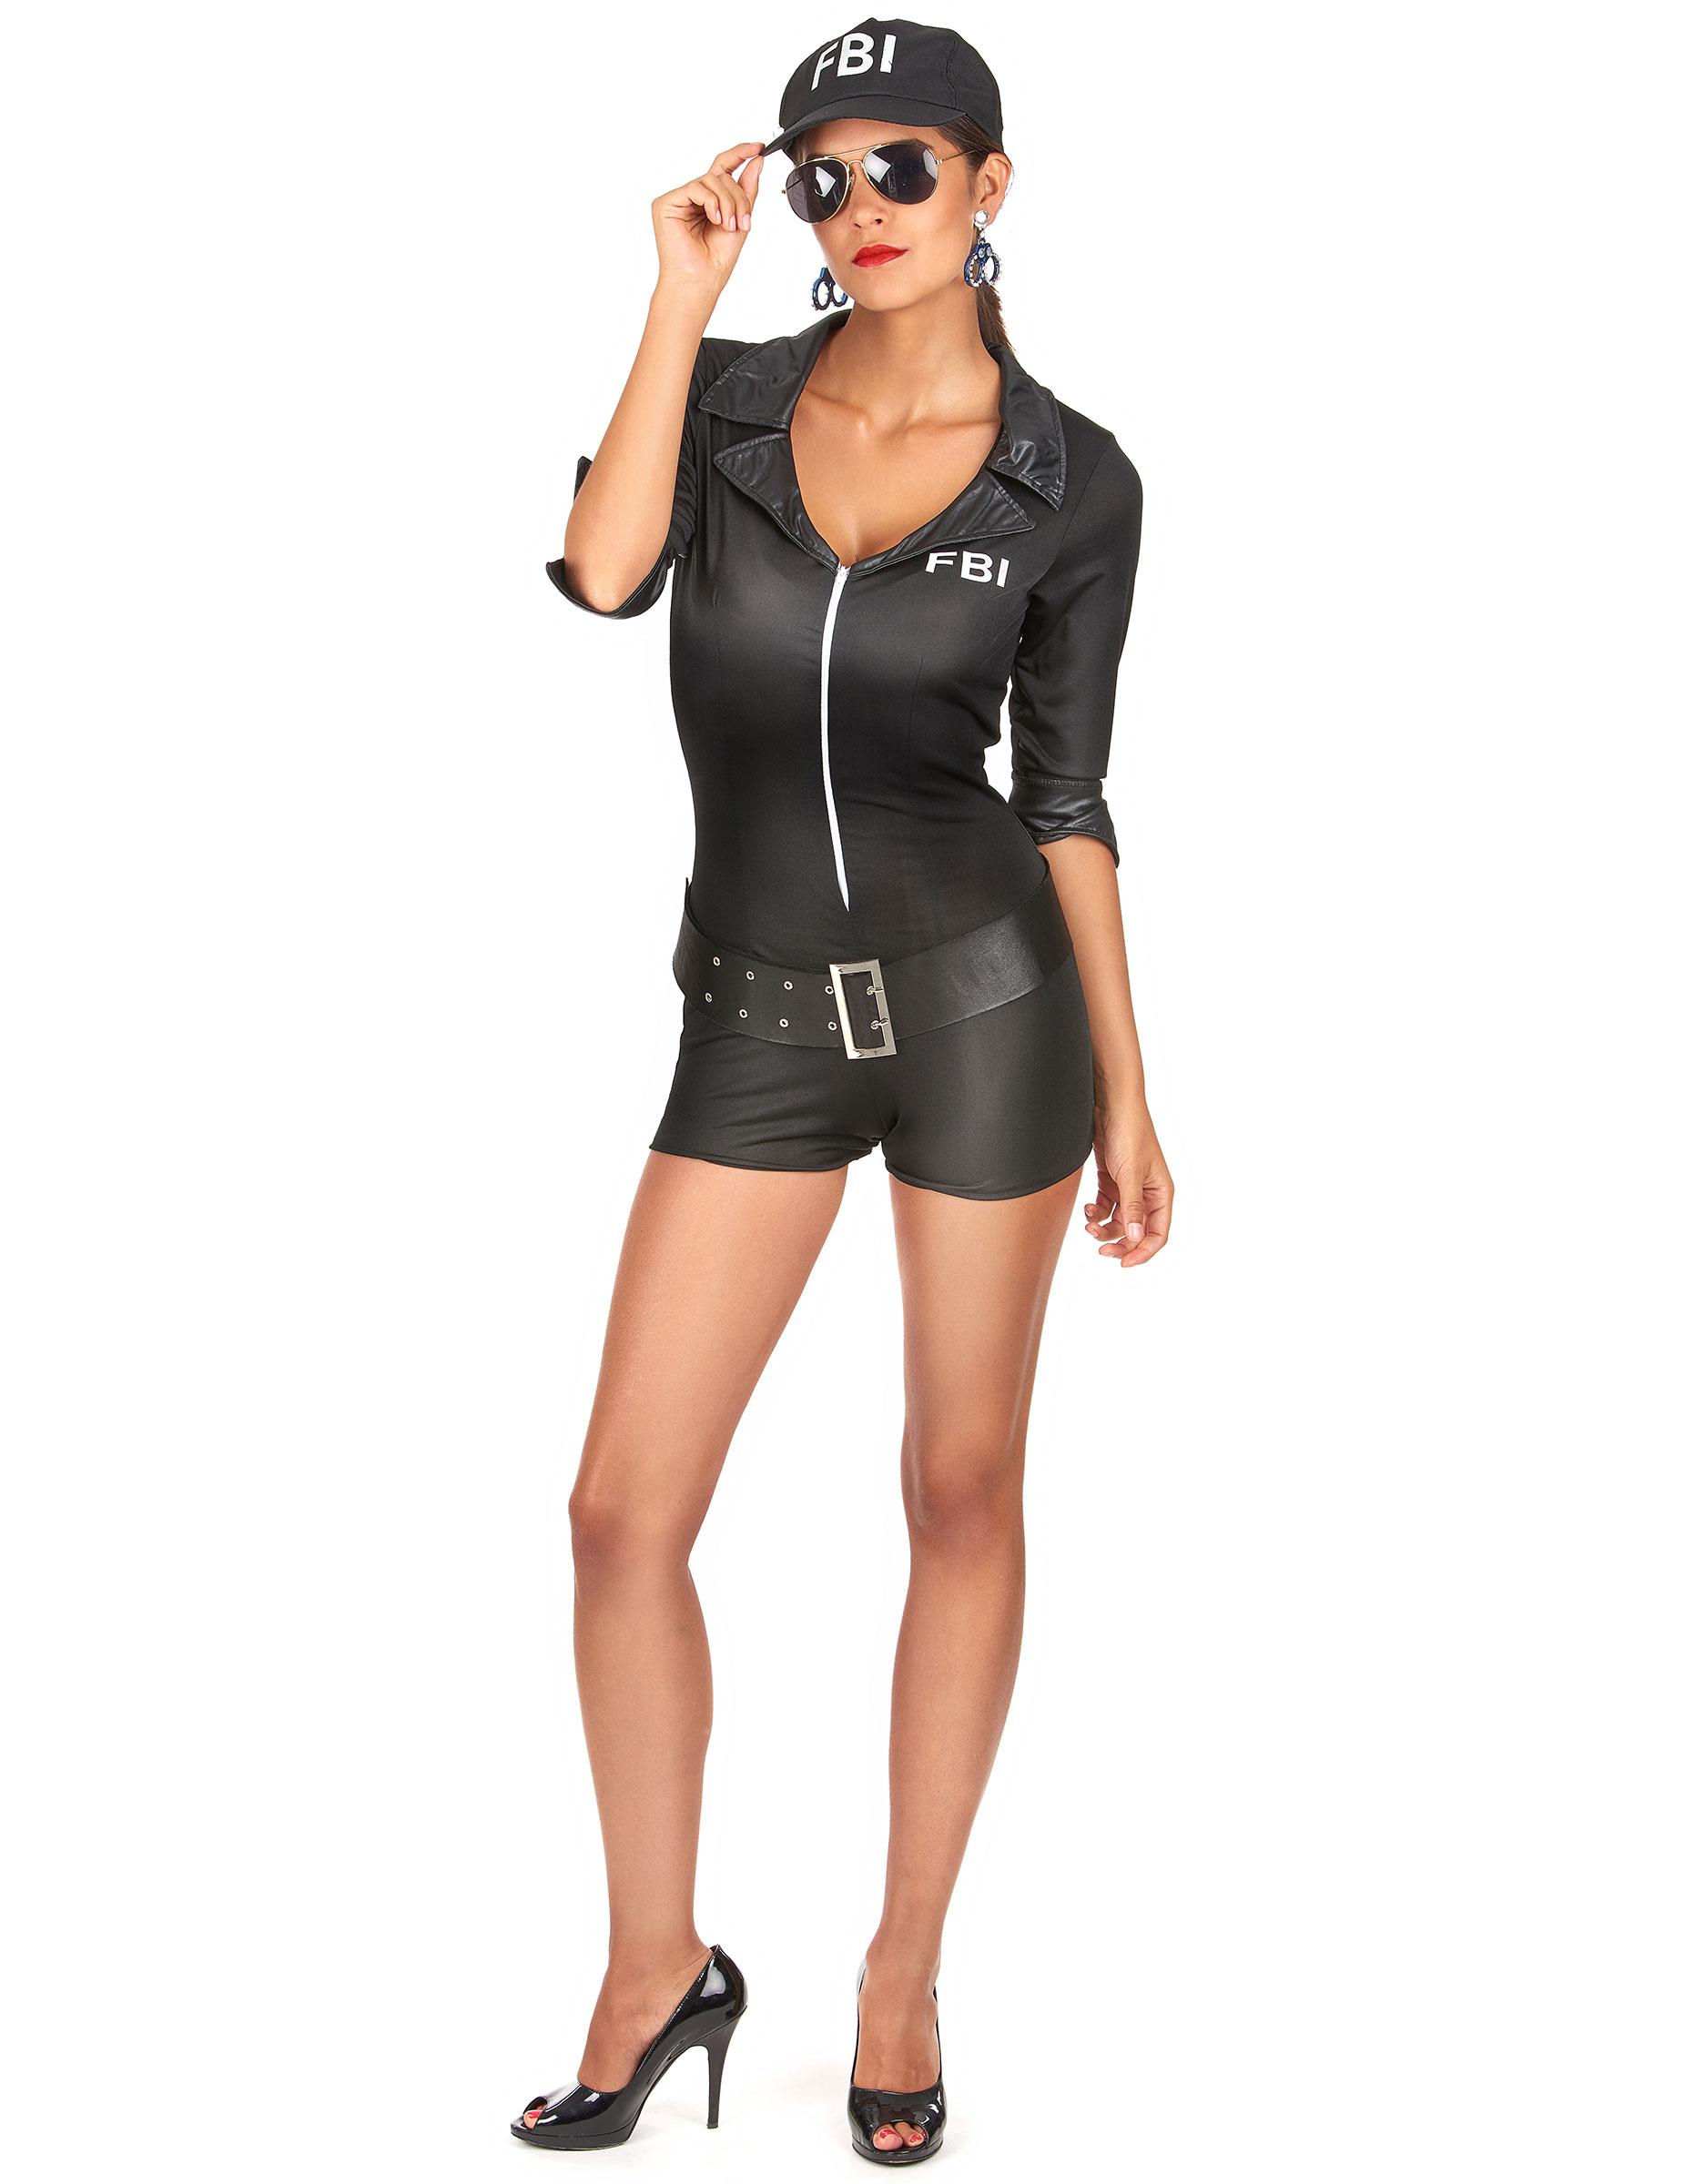 disfraz mujer fbi